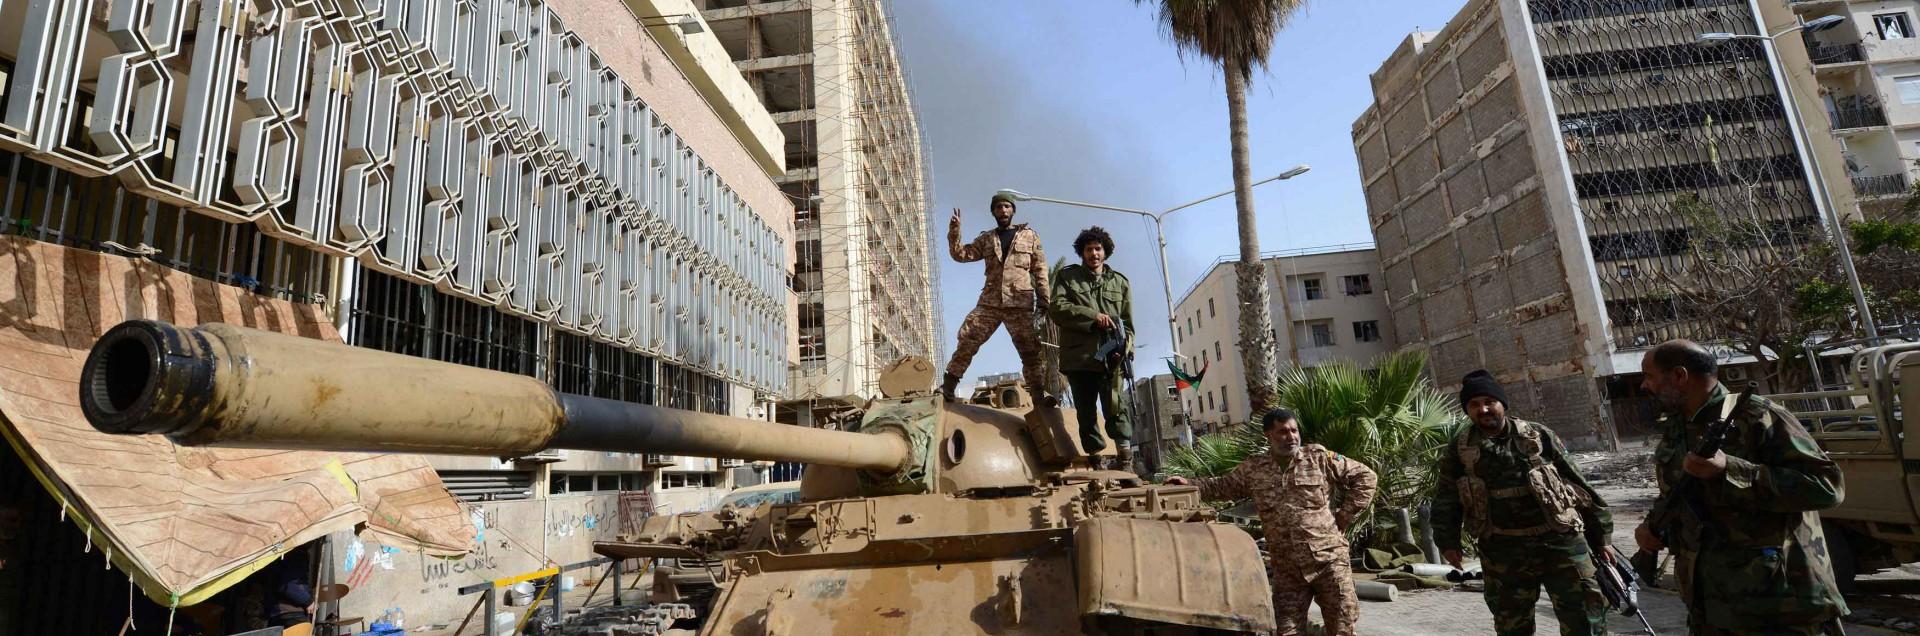 Libia, 7 febbraio: la grande paura